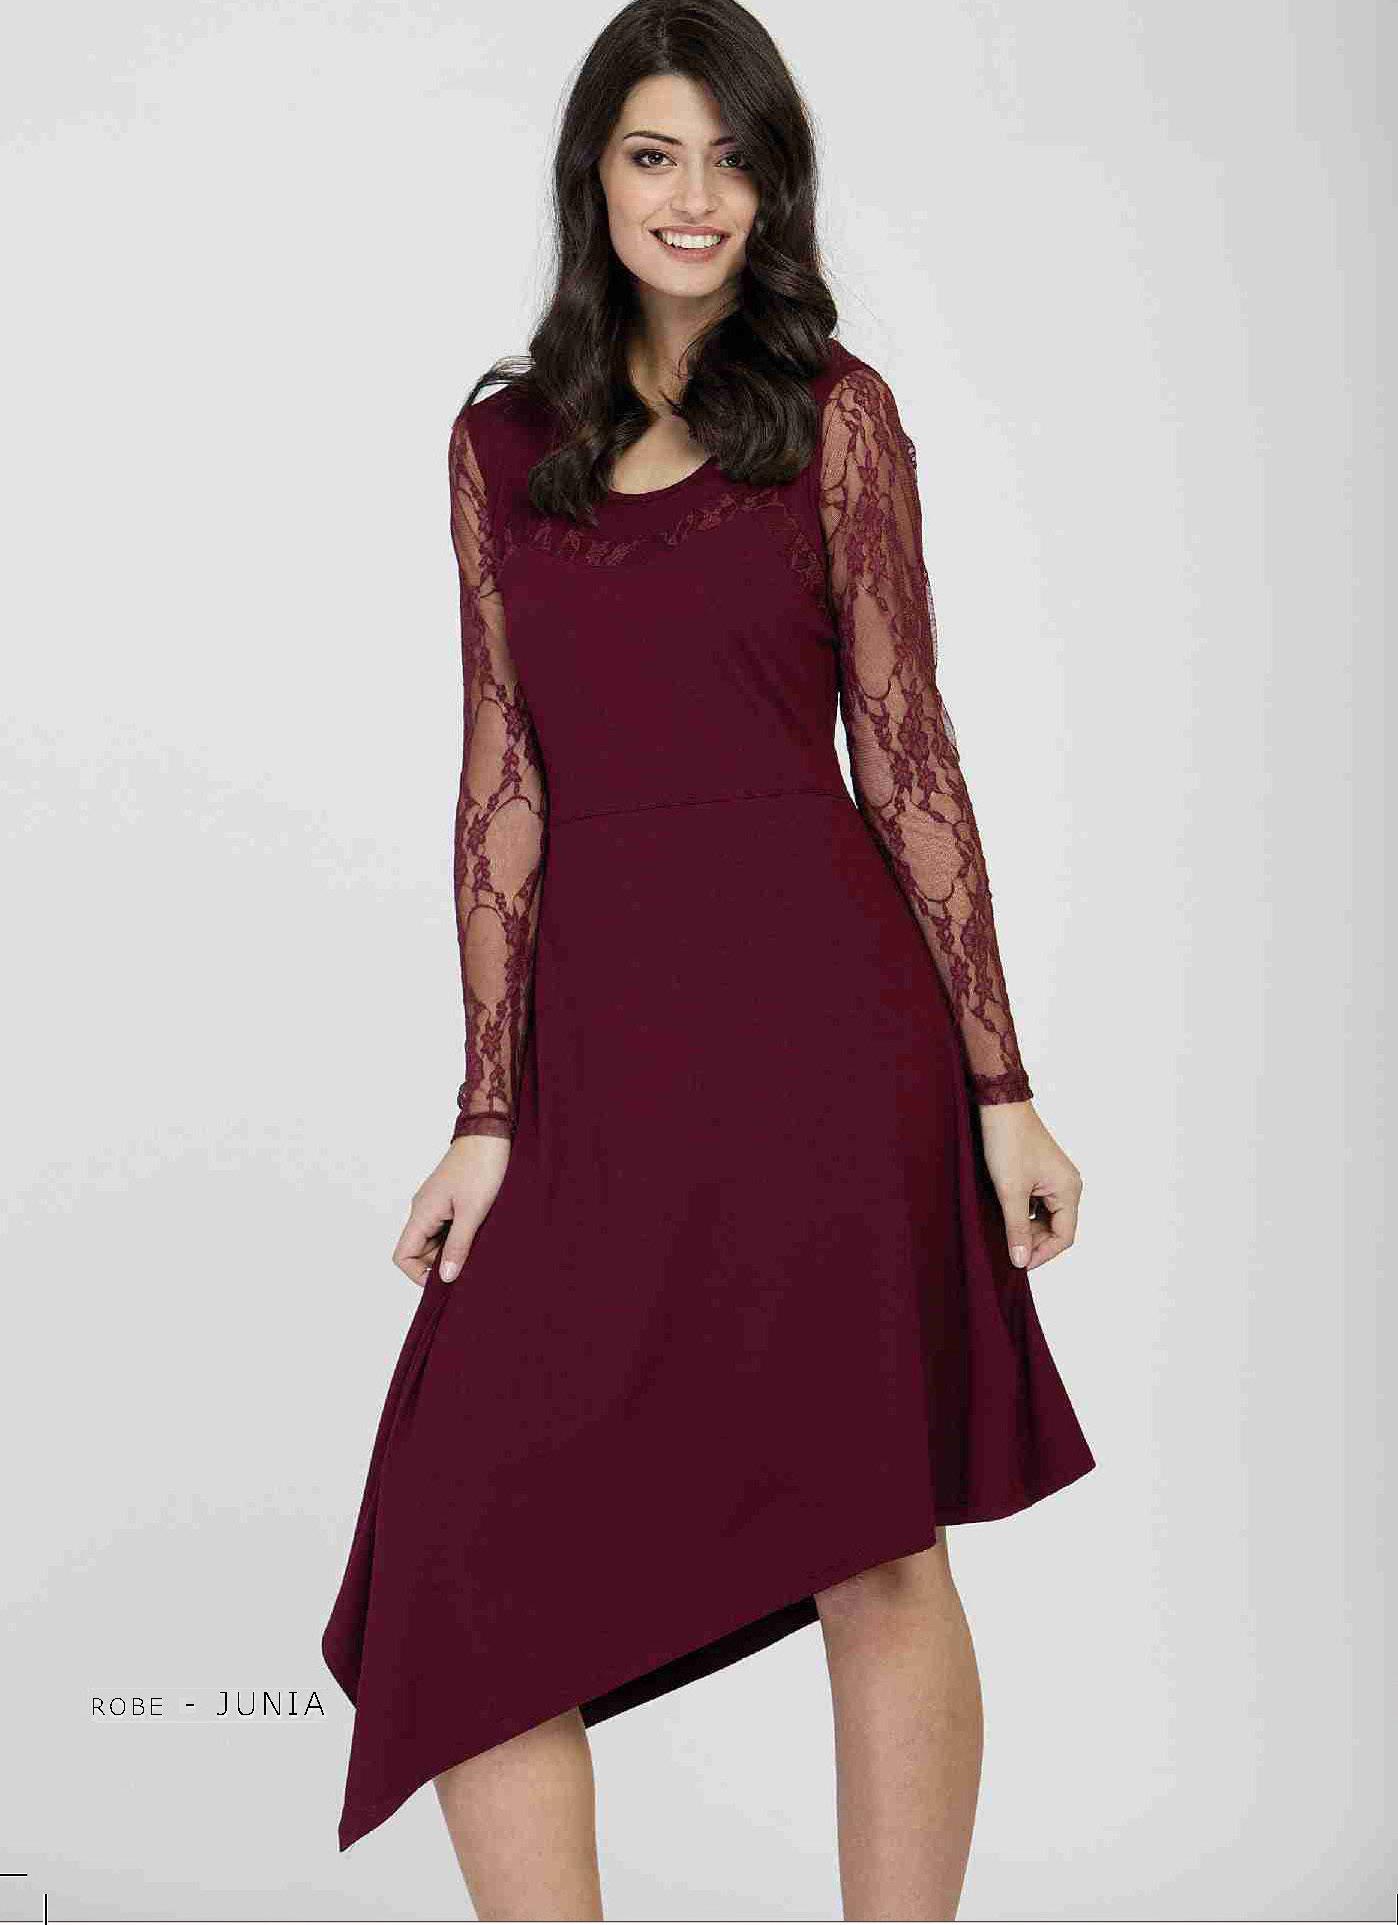 Maloka: Asymmetrical Cherry Lace Dress (Only Wine, Black & Titanium Left!) MK_JUNIA_N2